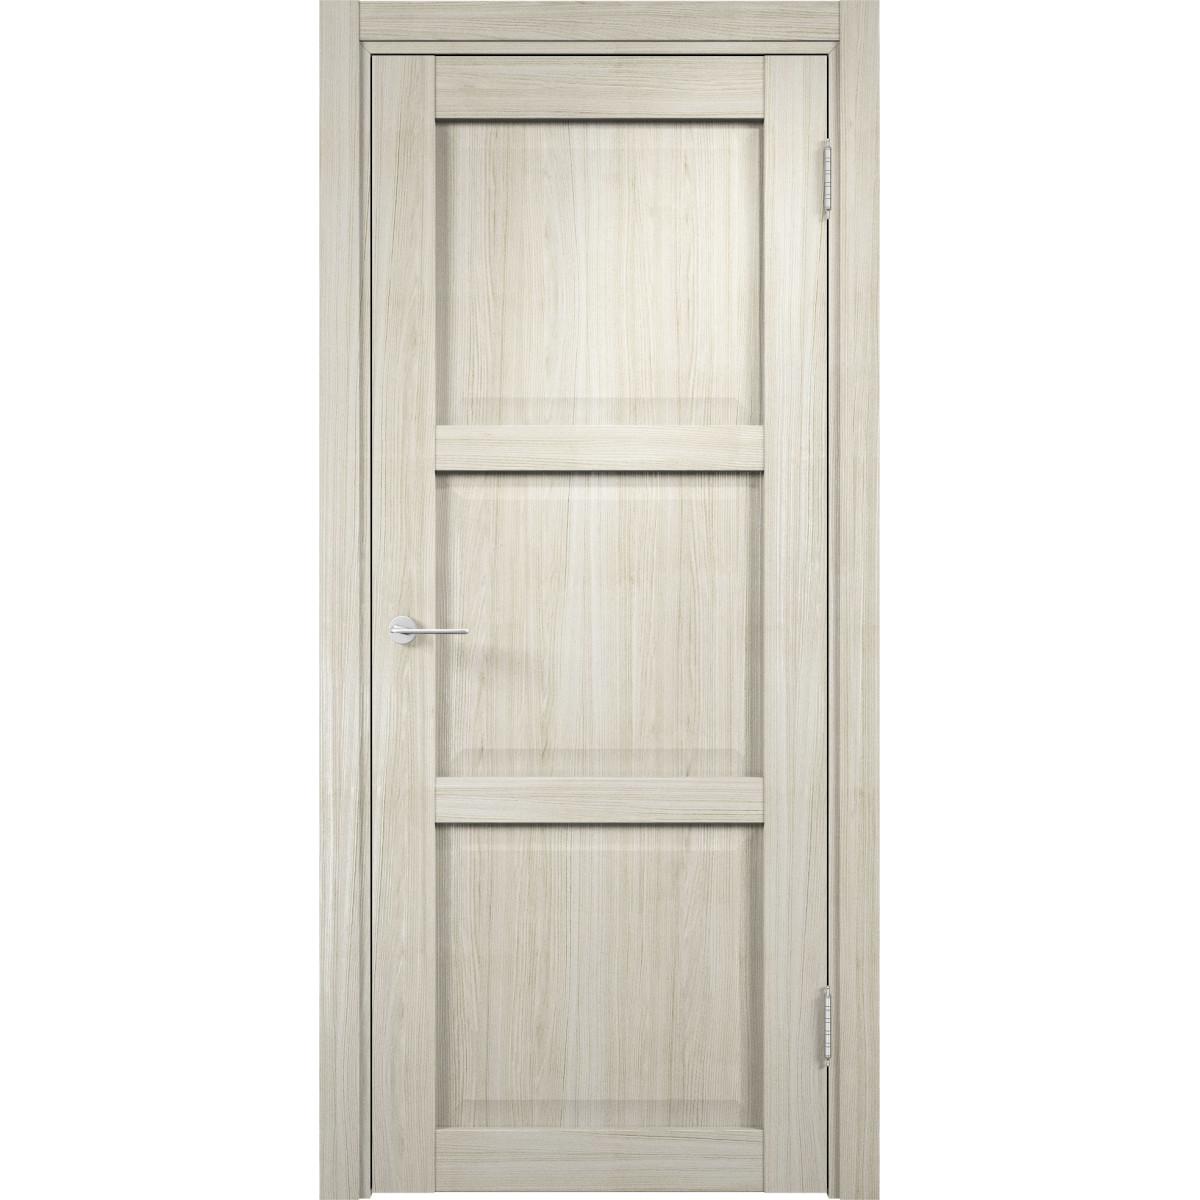 Дверное полотно Casaporte Рома МП_0091 2000х600х44 мм МДФ